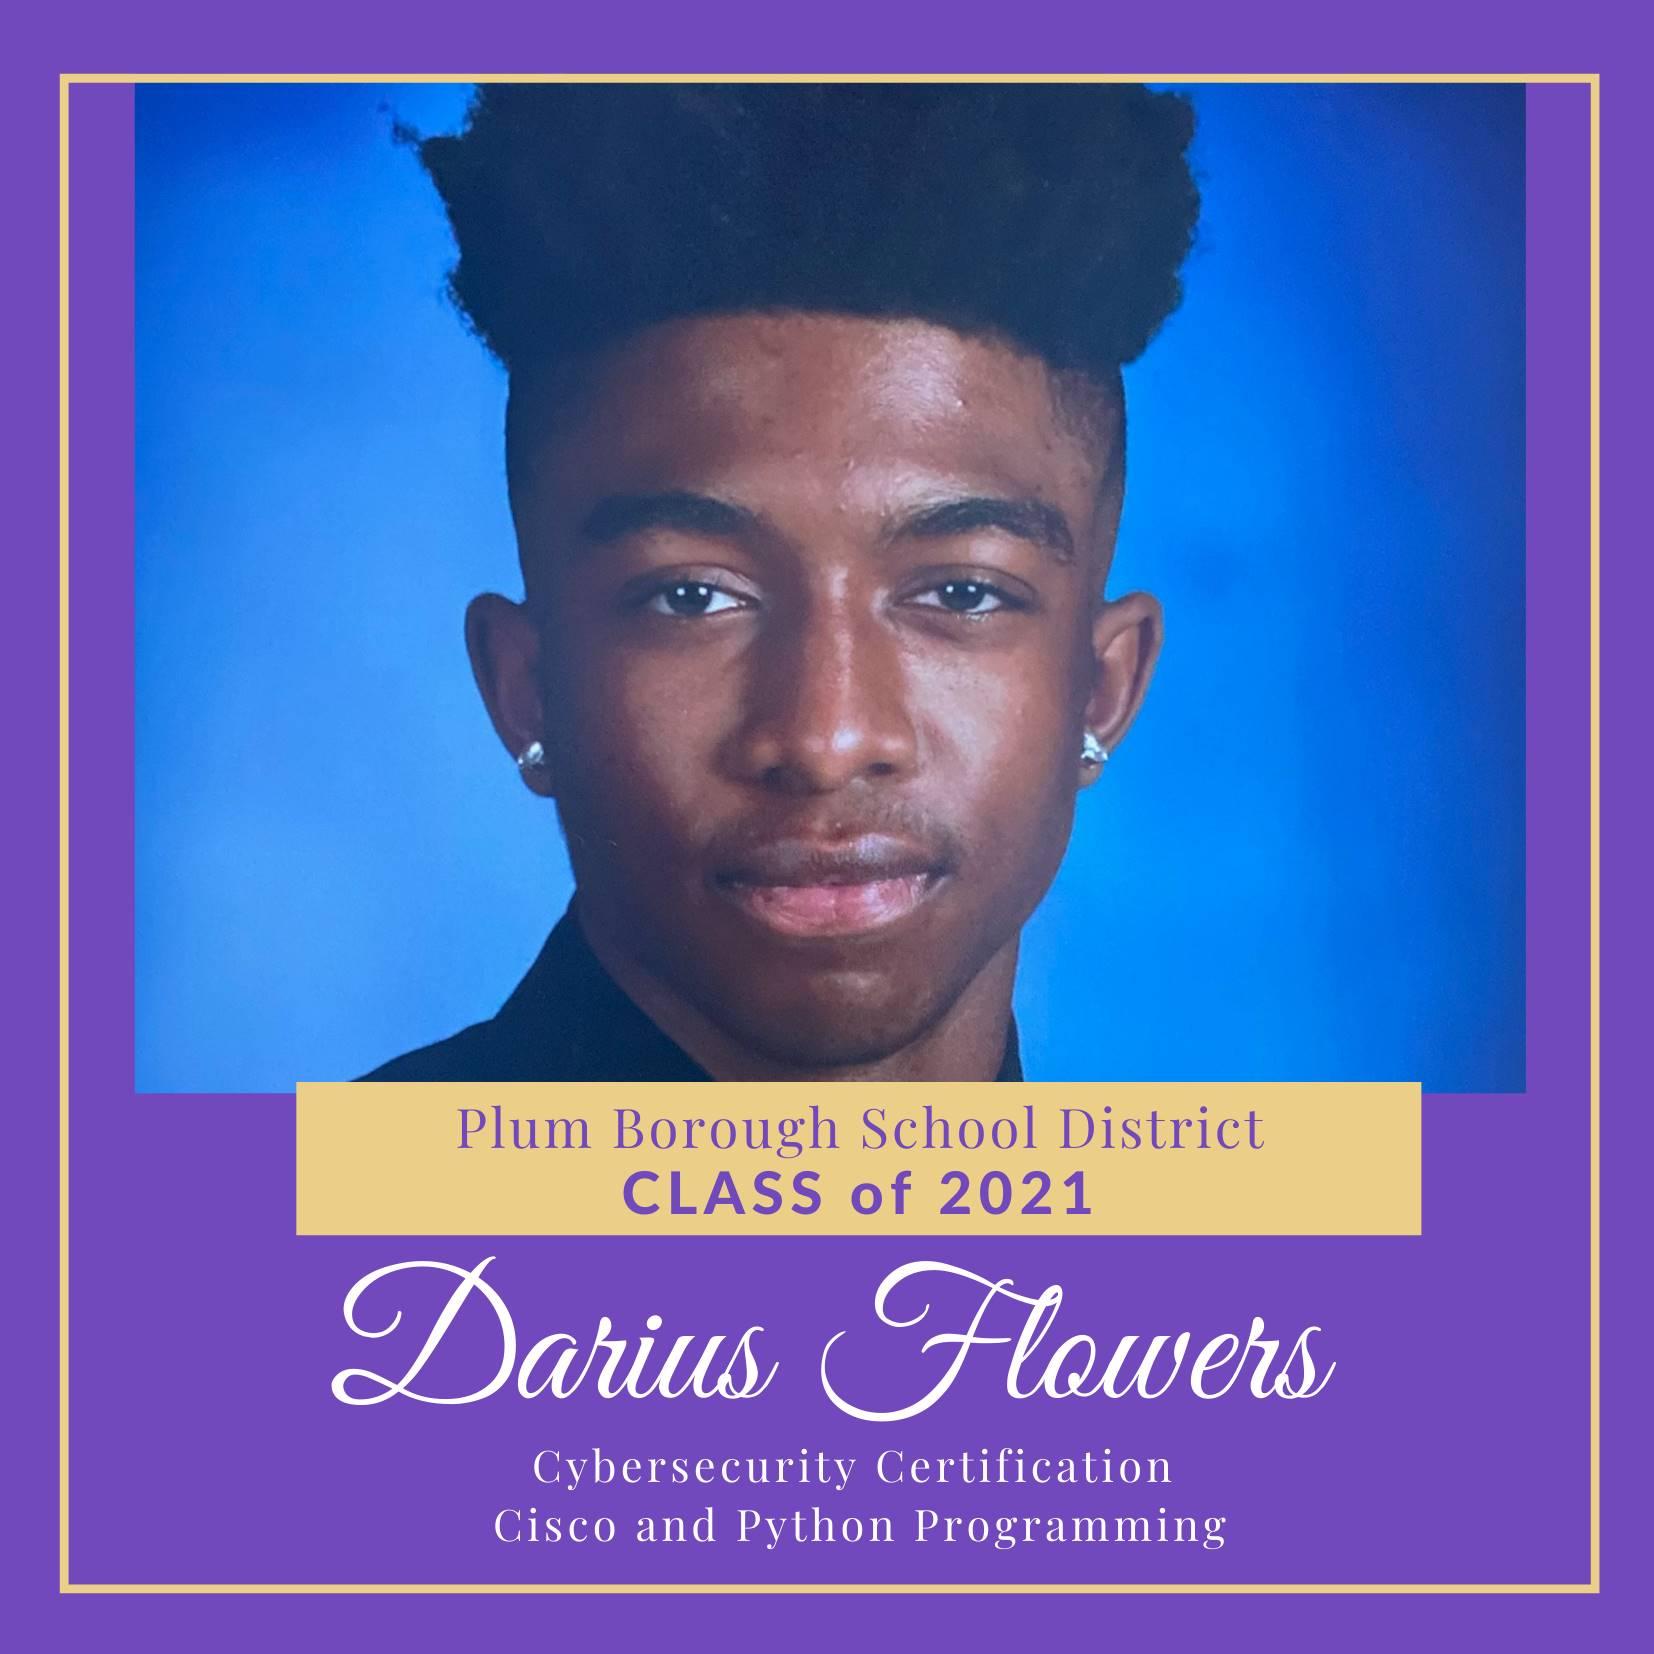 Congratulations to Darius Flowers, Class of 2021!